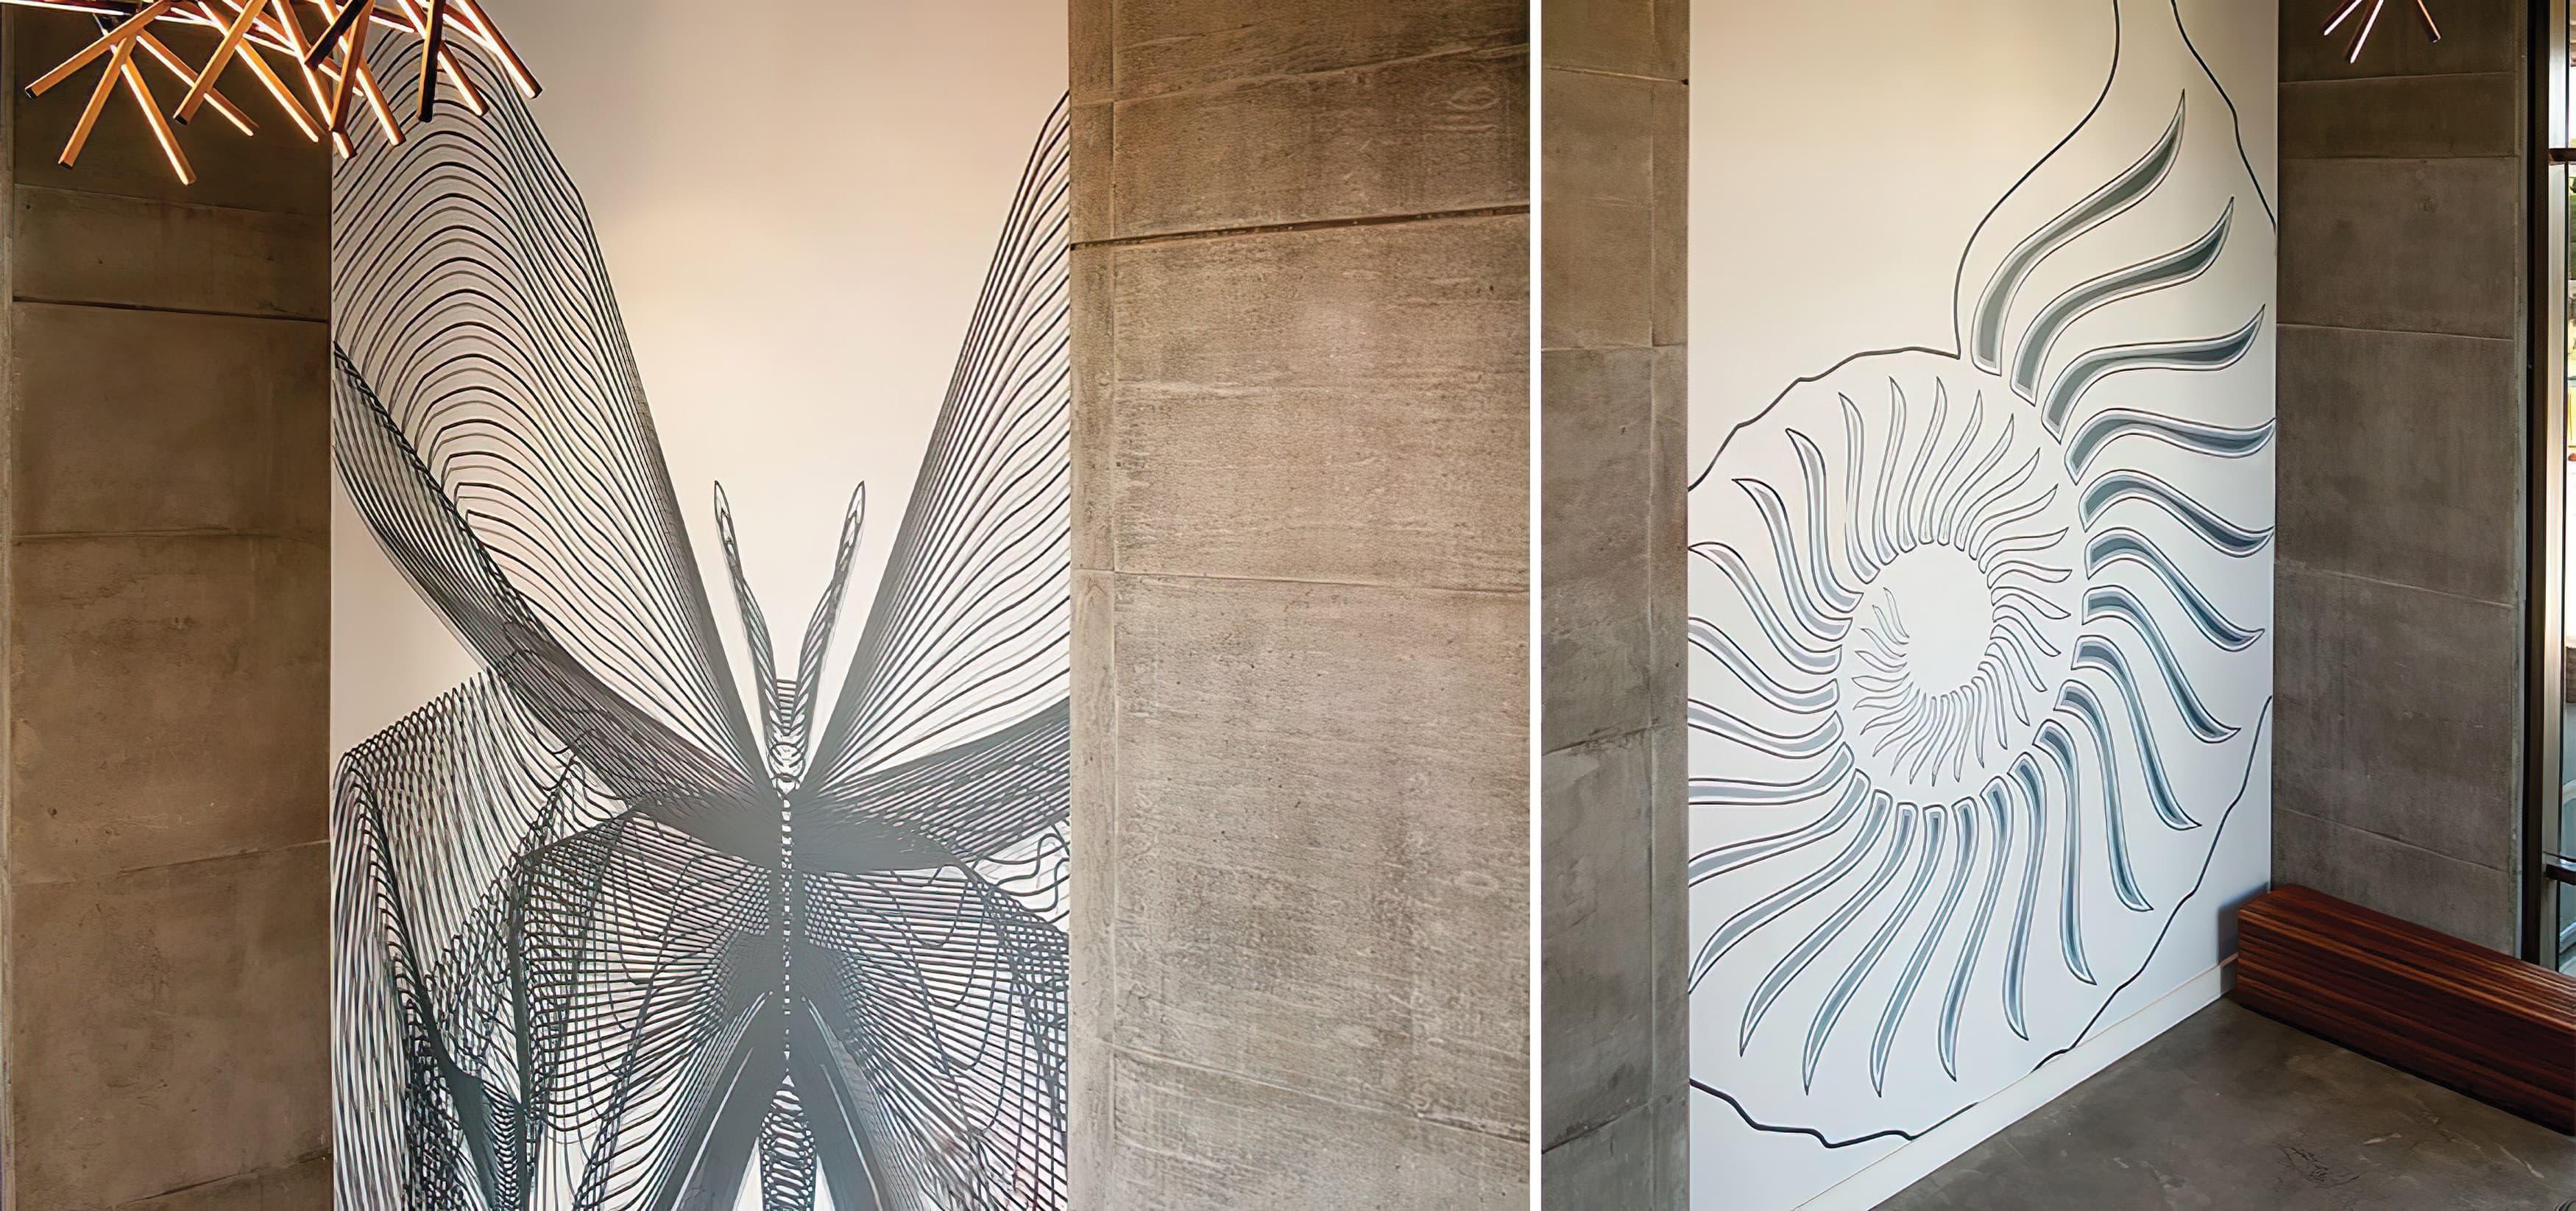 Mesa Court, located in University of California, Irvine campus. On-campus residential buildings. Mural and Public Art Design.